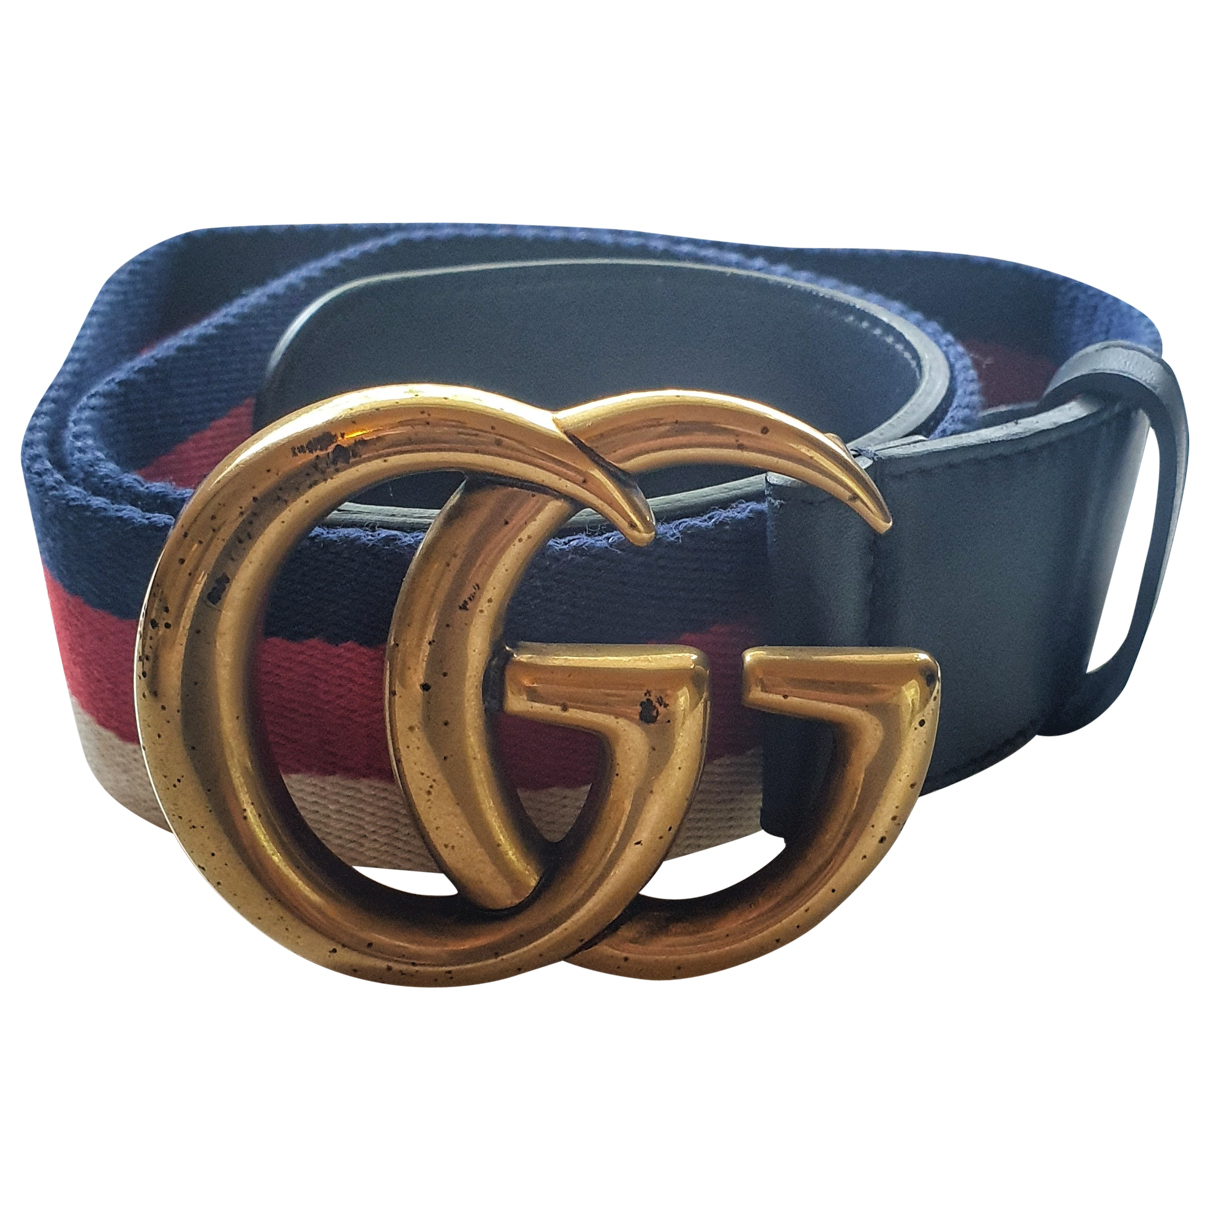 Gucci GG Buckle Navy Cloth belt for Women 75 cm